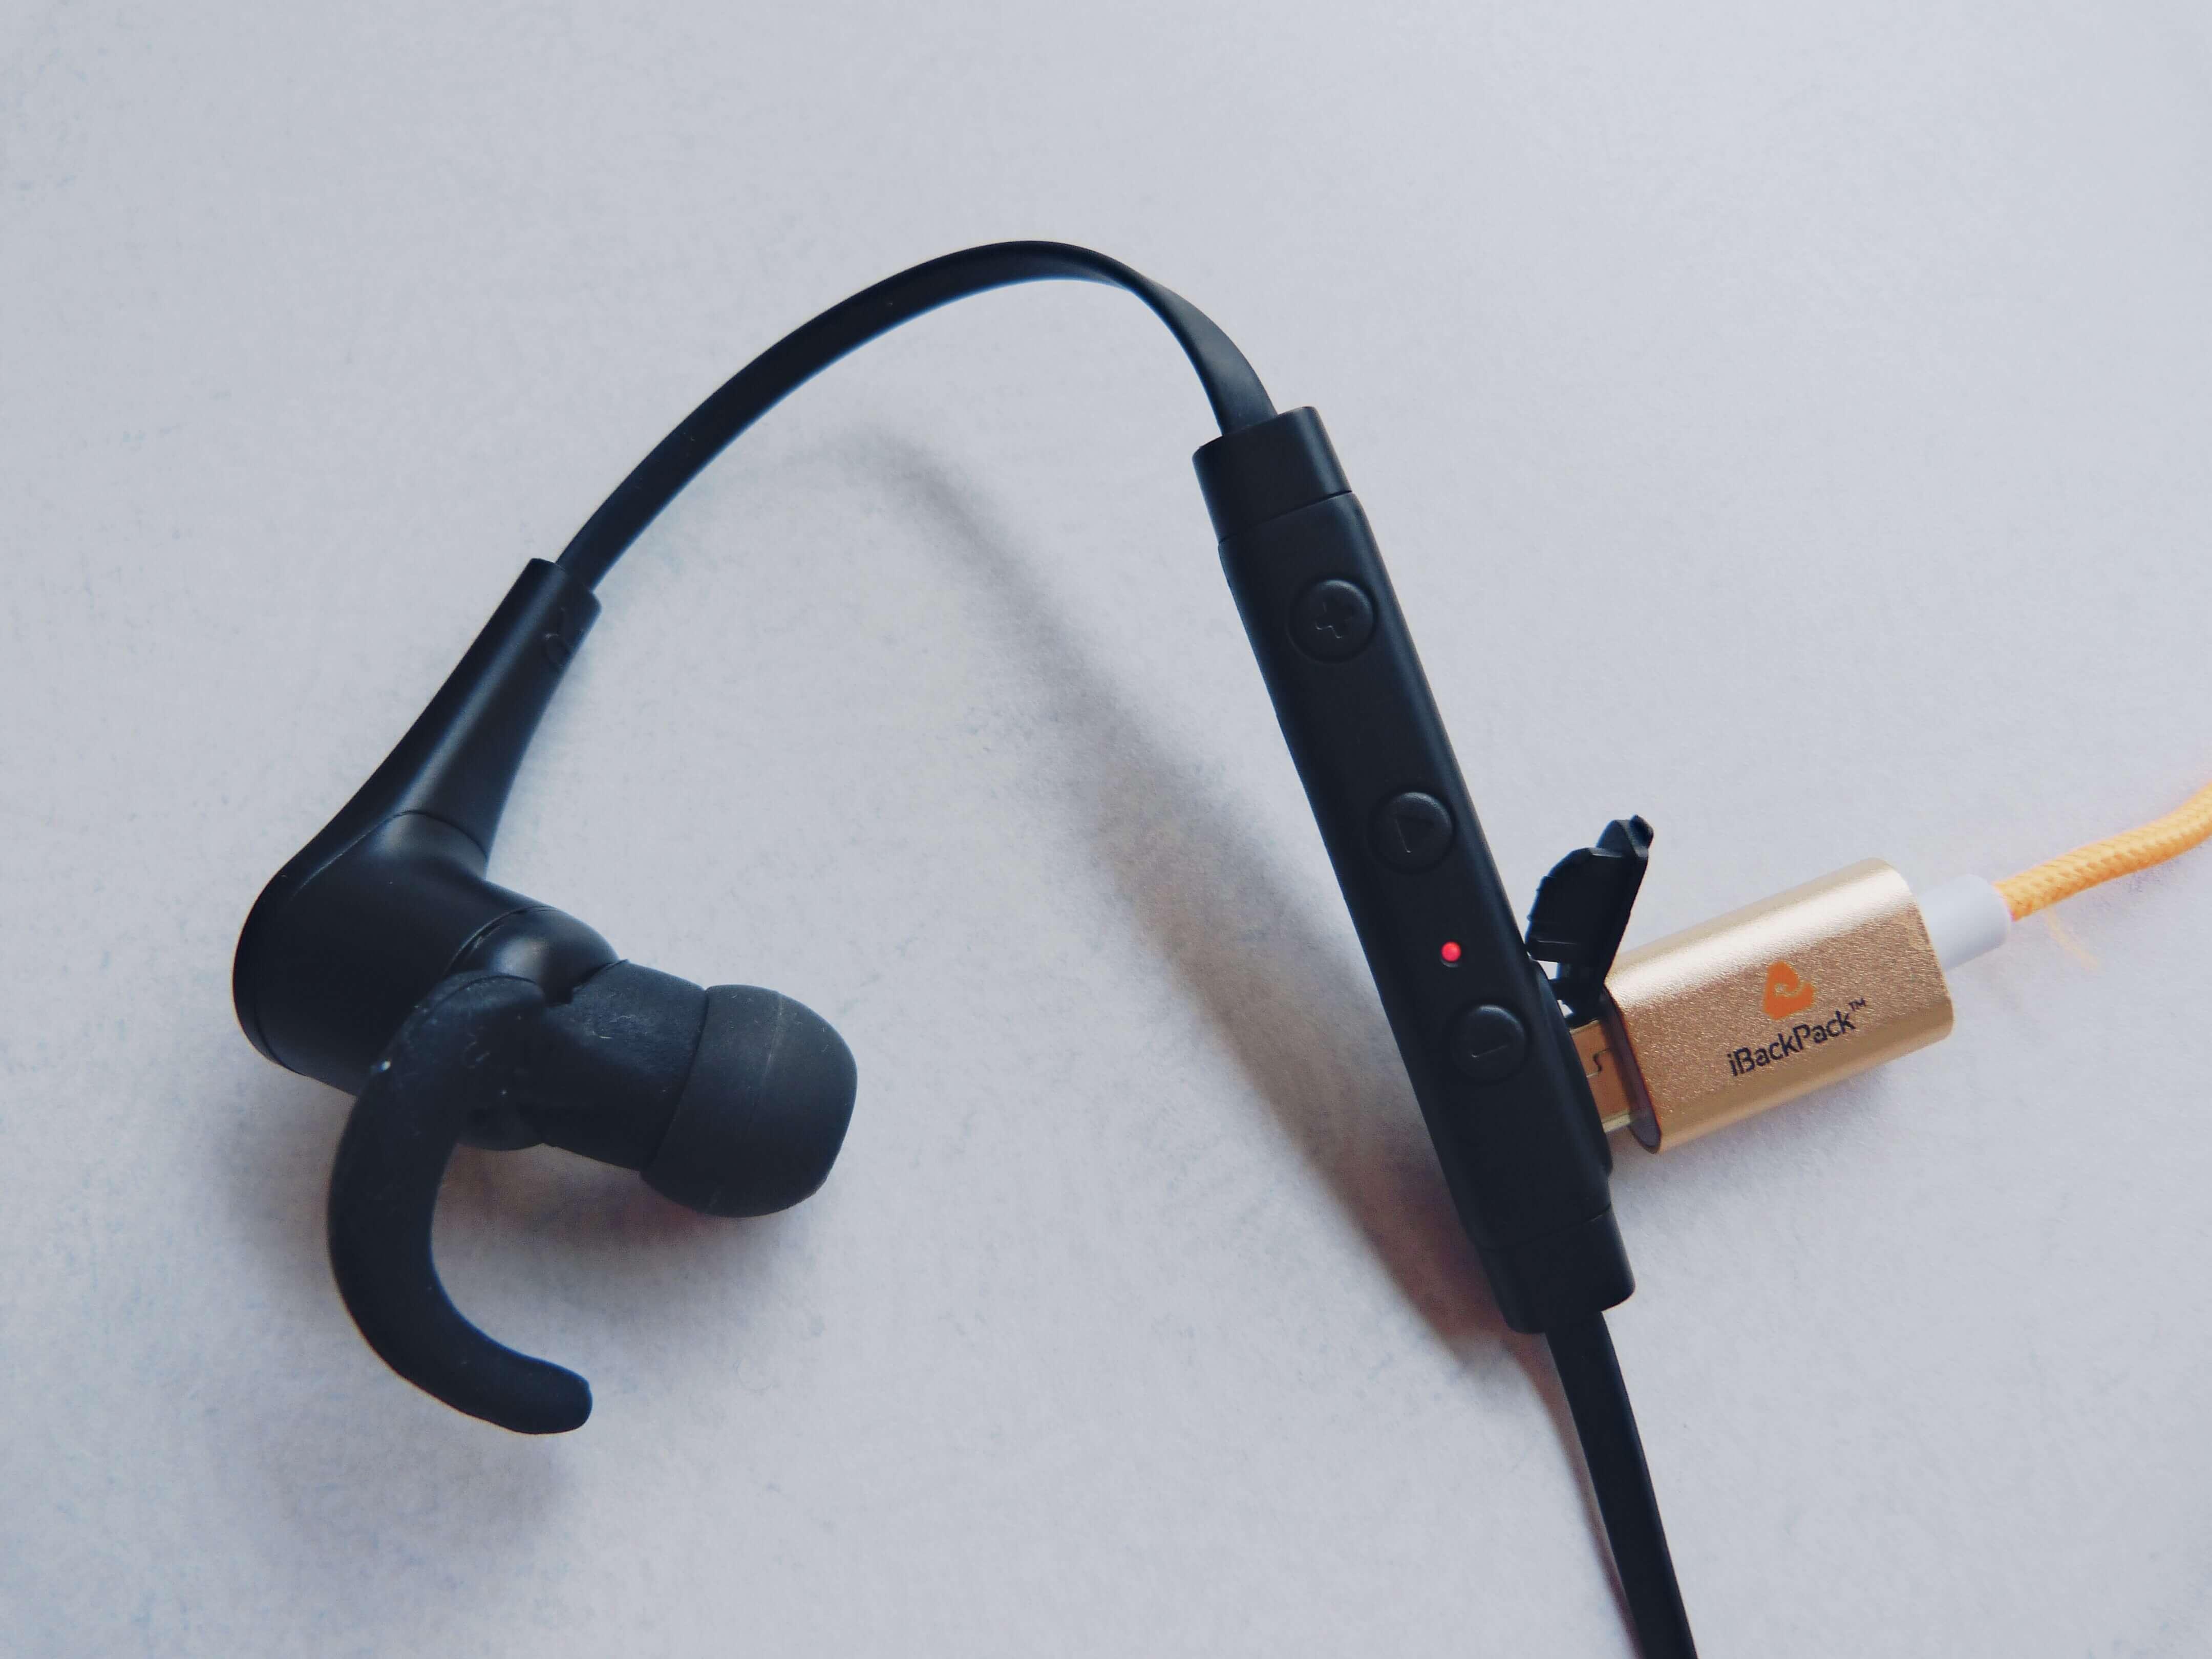 aukey_Bluetoothearphones01